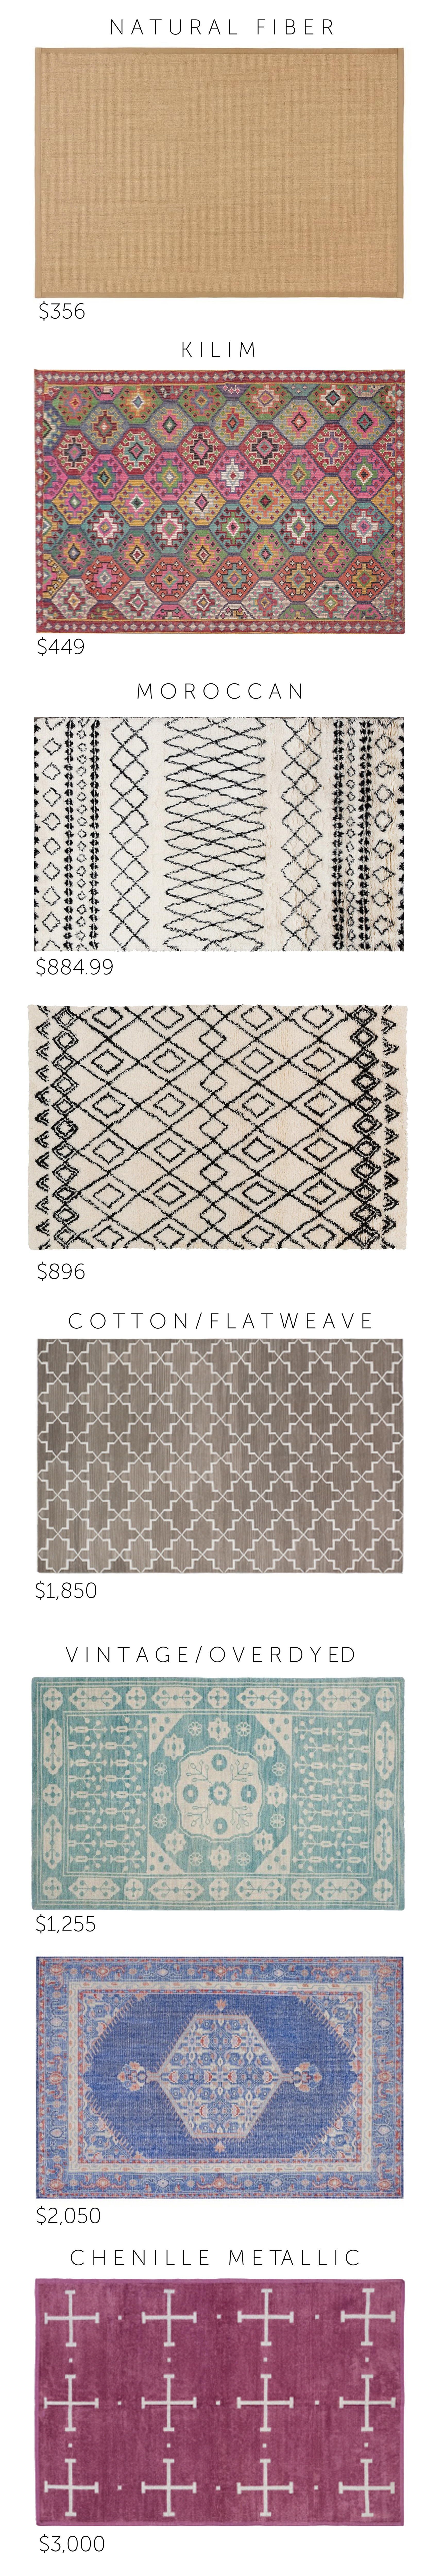 natural fiber     kilim     moroccan 1     moroccan 2     cotton/flatweave     vintage/overdyed 1     vintage/overdyed 2     chenille metallic